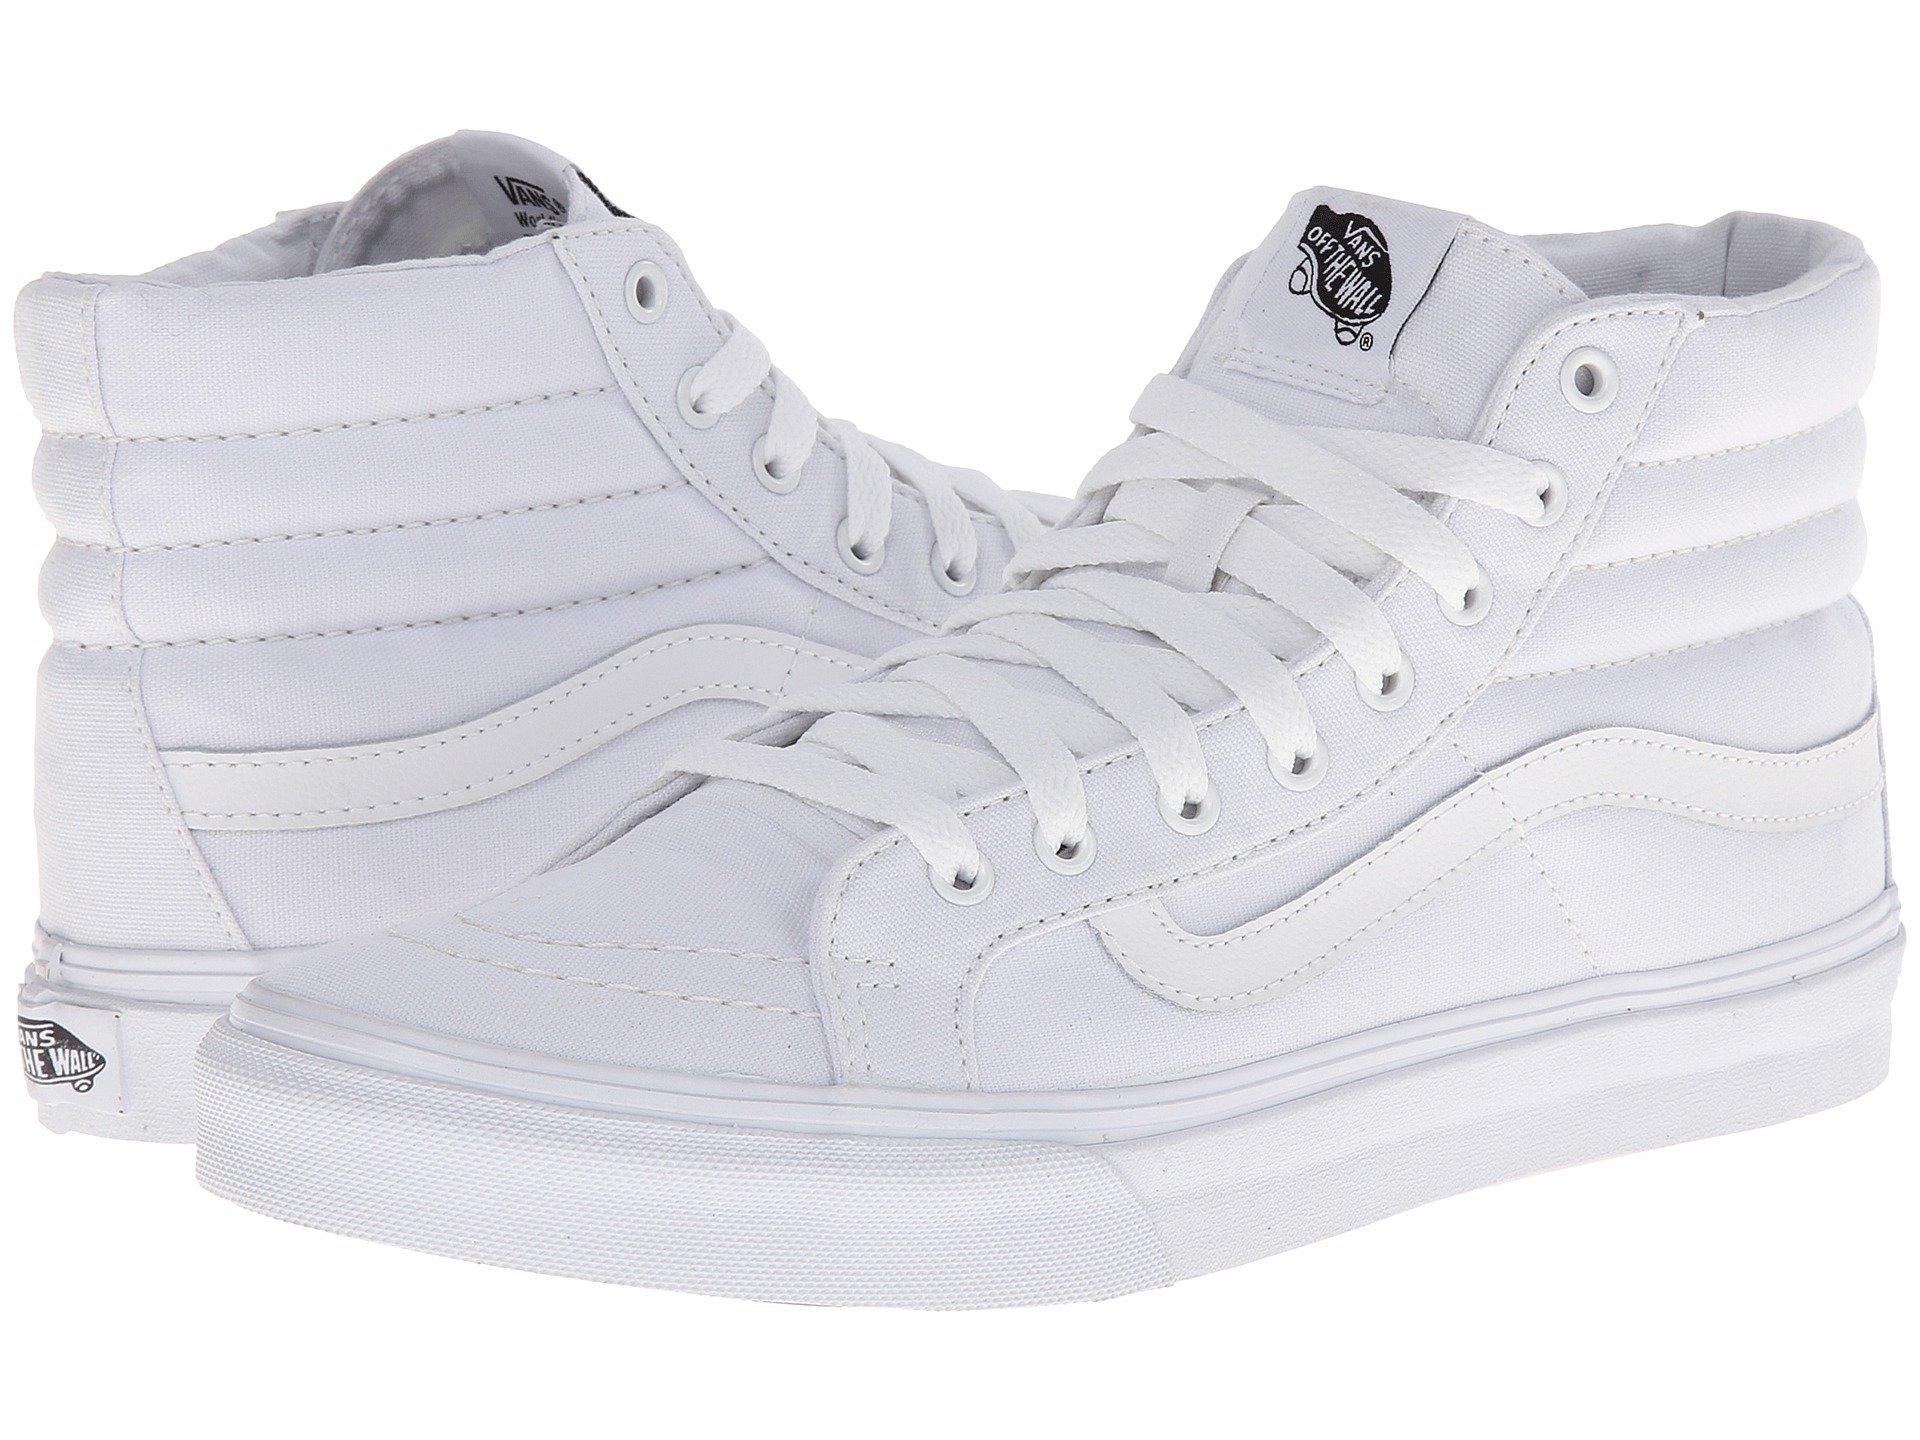 Vans Mens Sk8-Hi Slim Hight Top Lace up Skateboarding Shoes (8.5 B(M) US Women/7 D(M) US Men, True White)